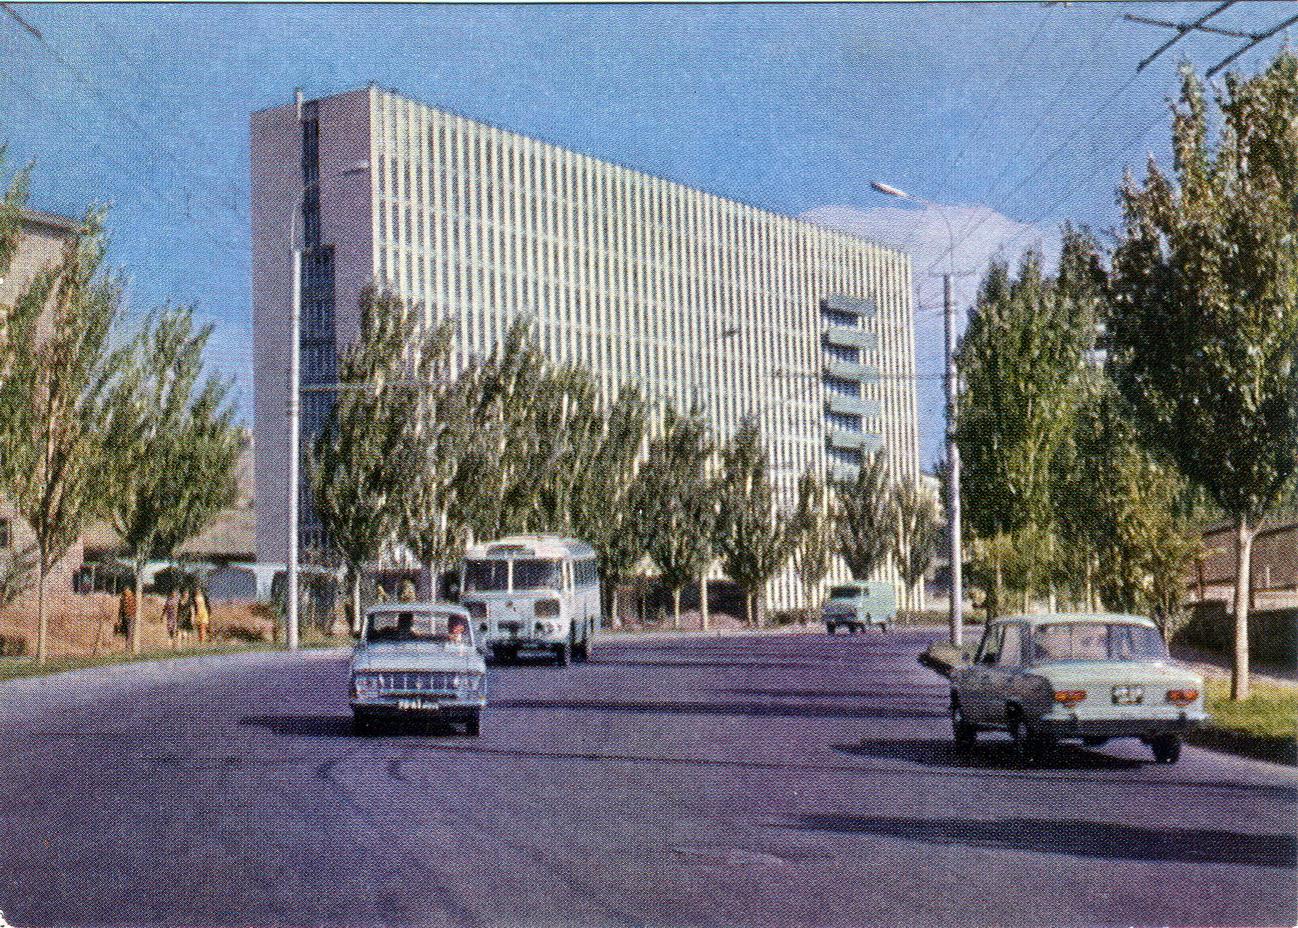 Erevan - Institut kardiologii i serdechnoy hirurgii_resize